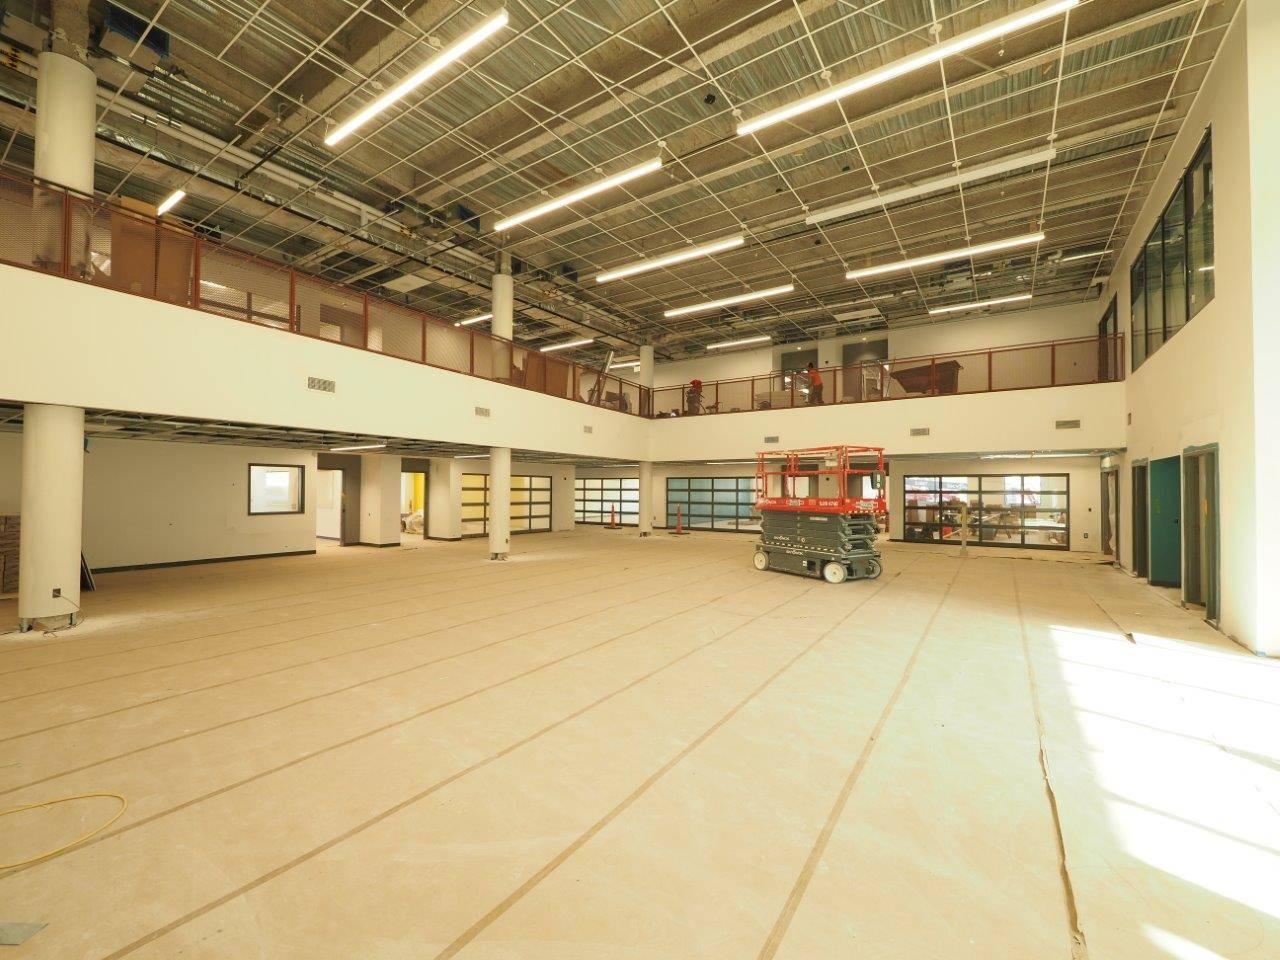 Academic commons in the new Upper Arlington High School